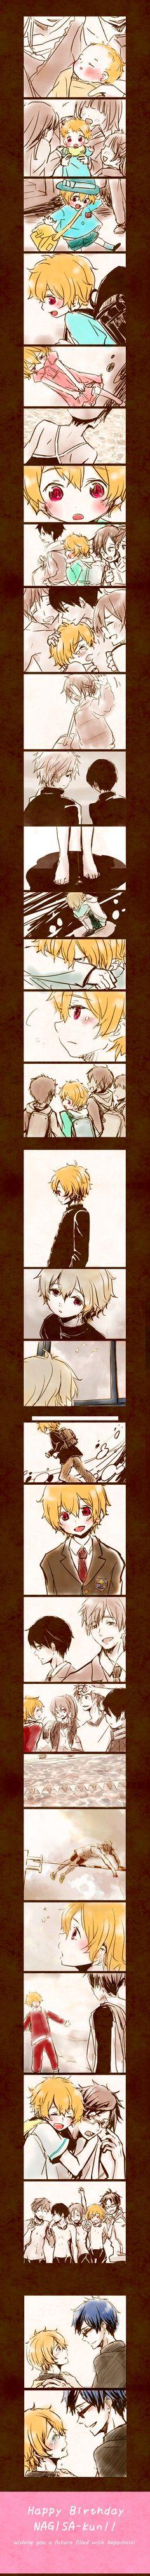 "Free! ~~ ""Happy Birthday, Nagisa-kun!"" :: Artist unknown but terribly awesome!"